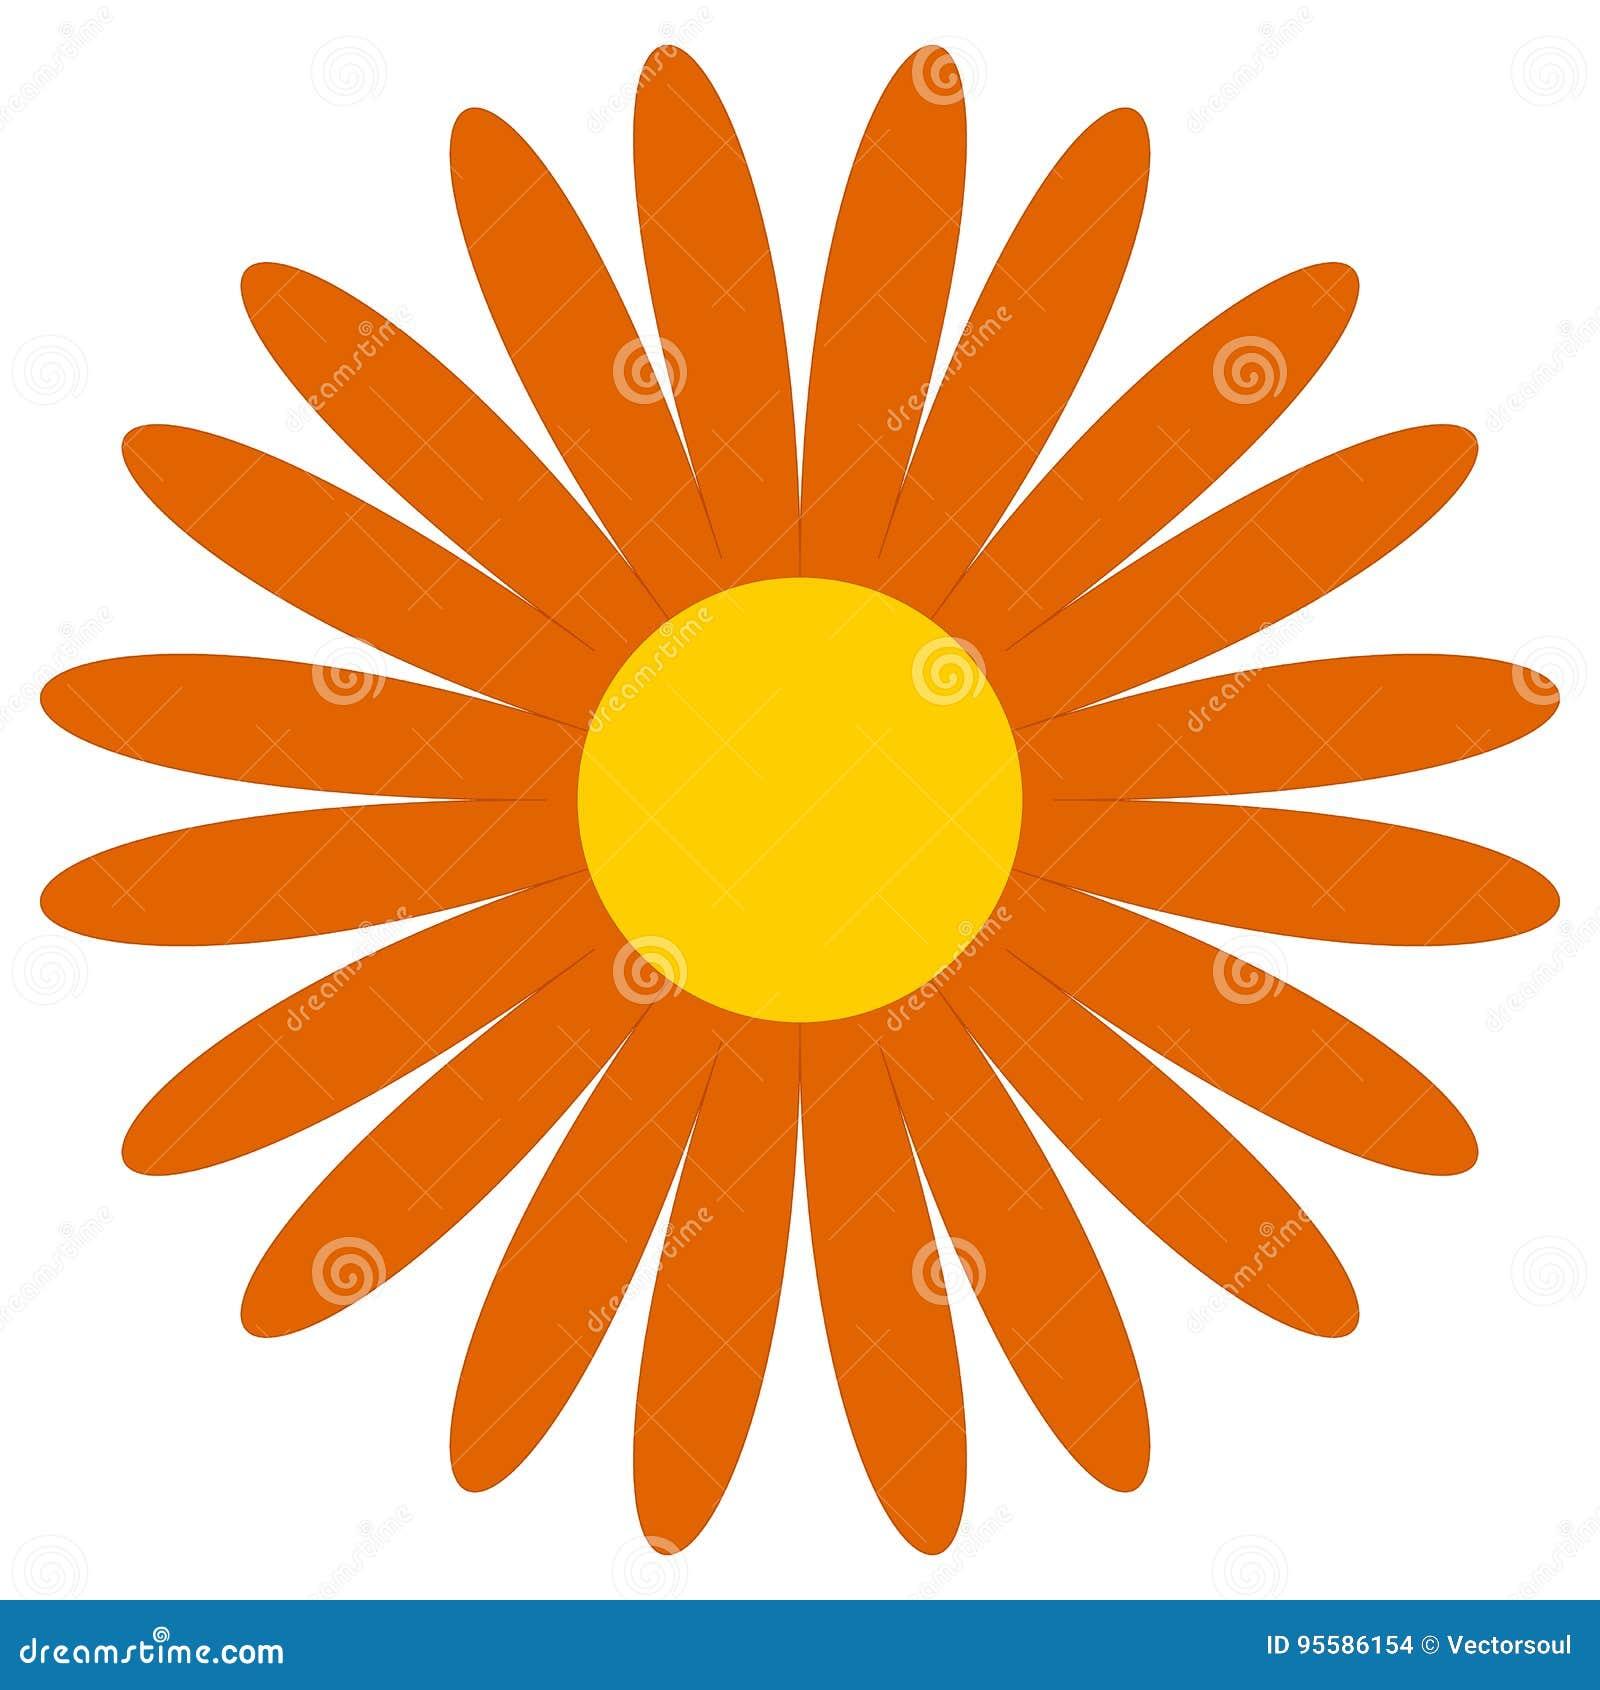 Agrafe Art Classique De Fleur Marguerite Orange Simple Icone De